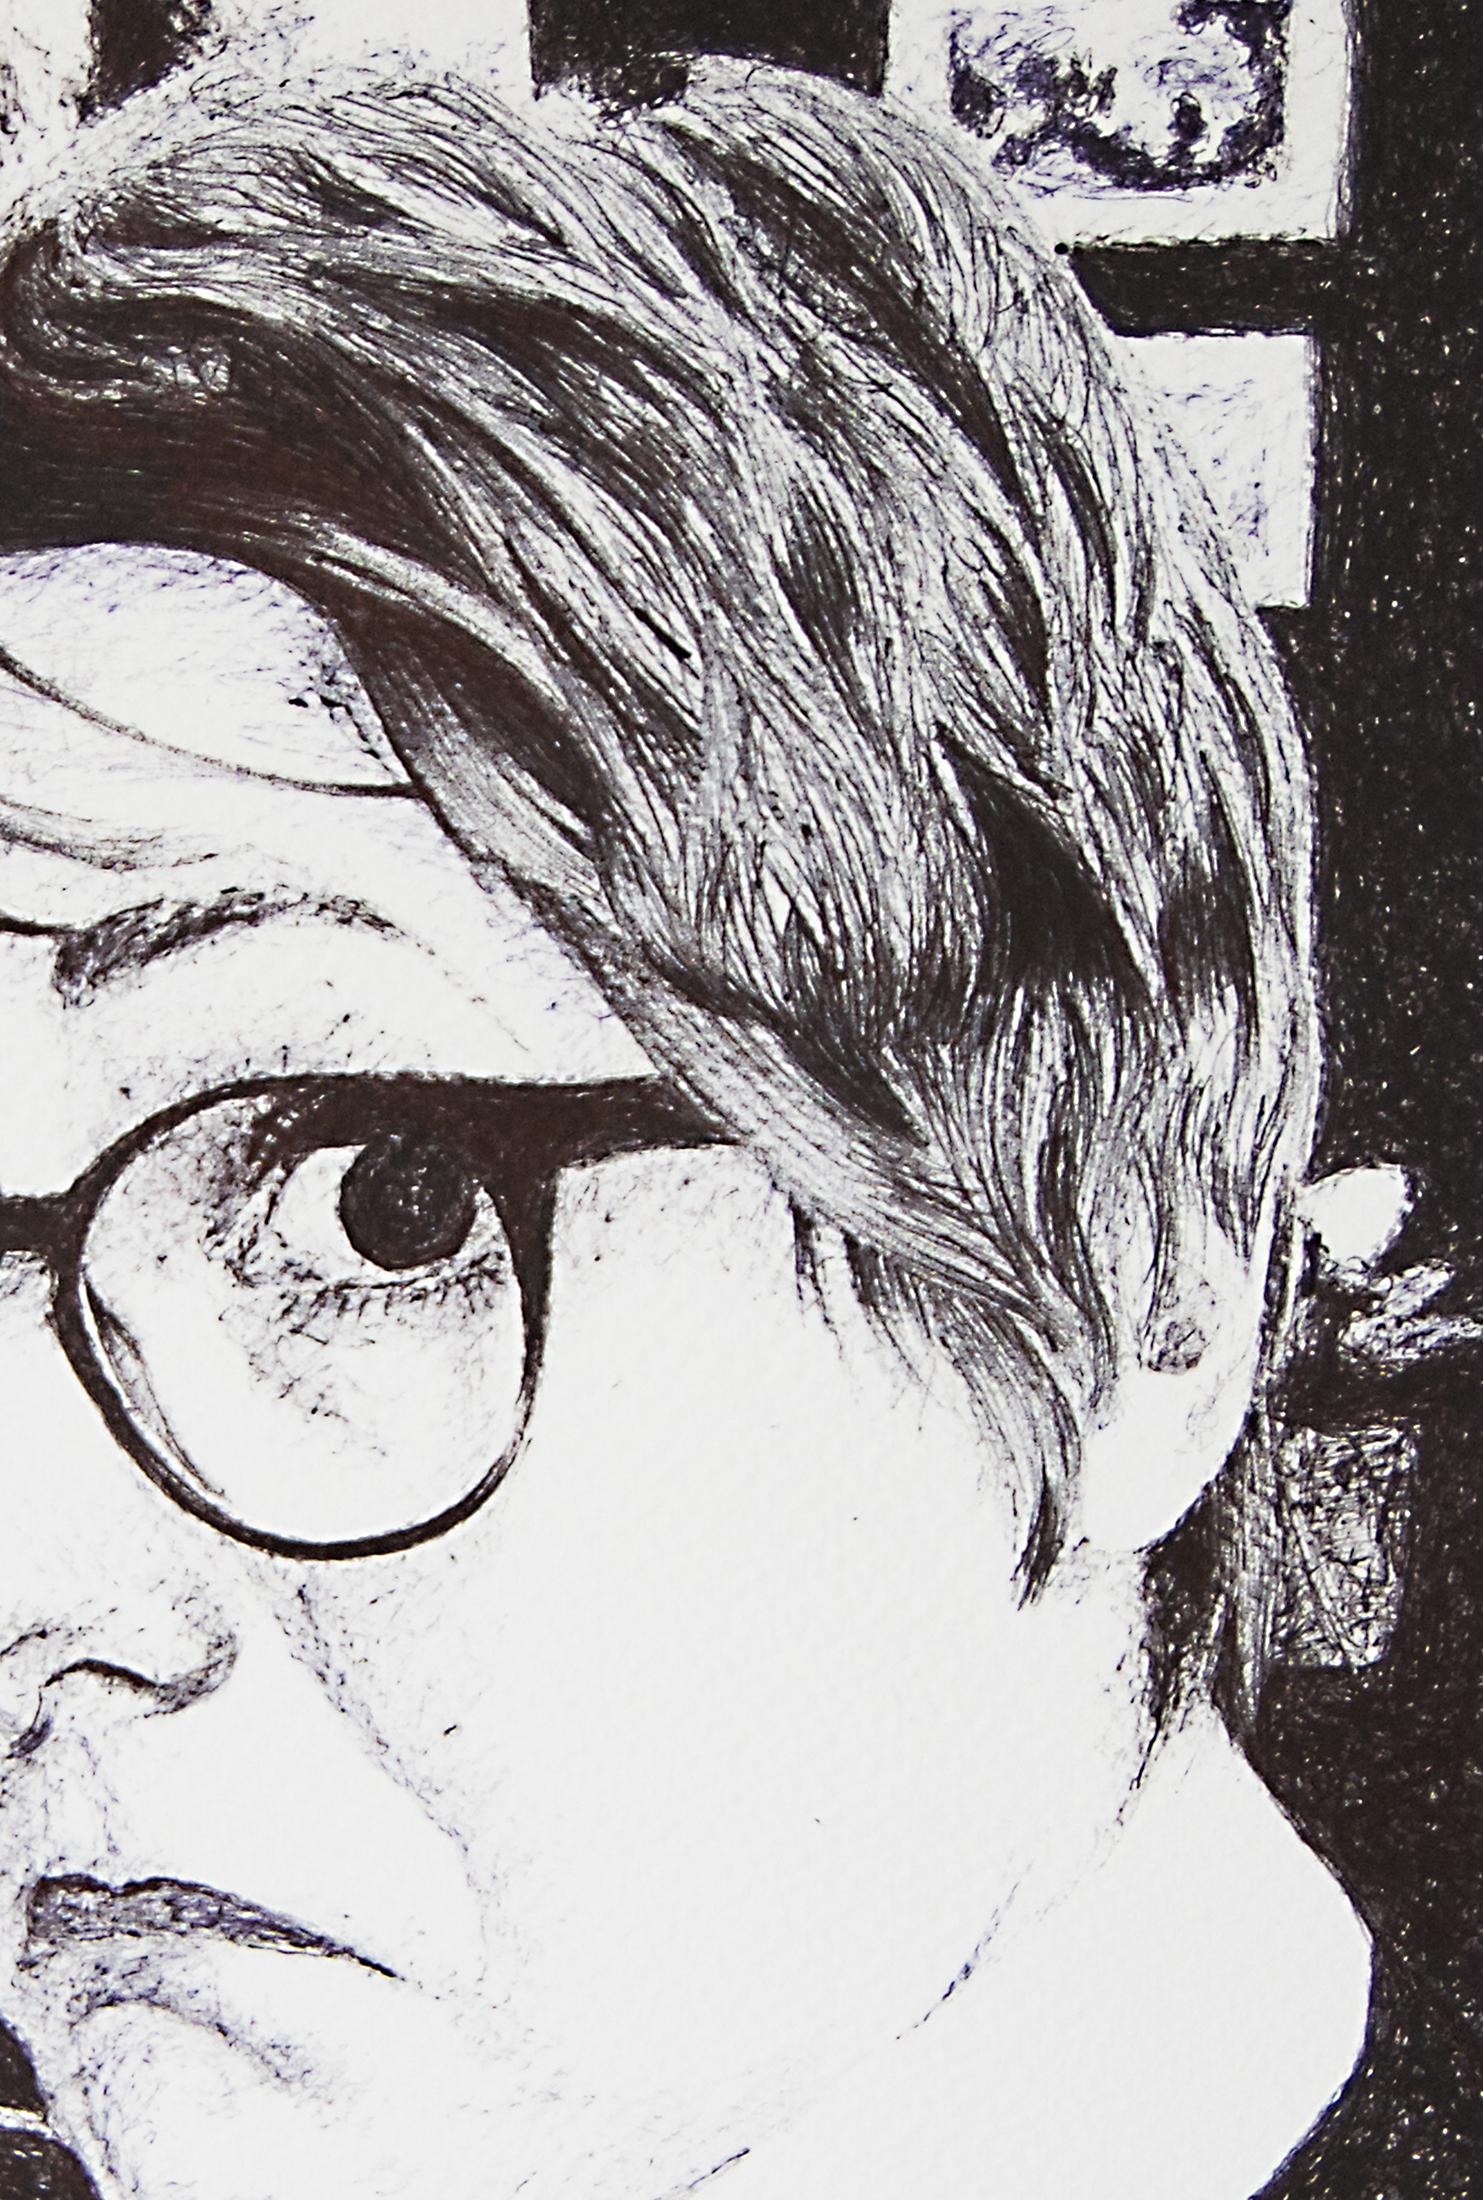 Self-Portrait, Detail, Pen & Ink, 2016